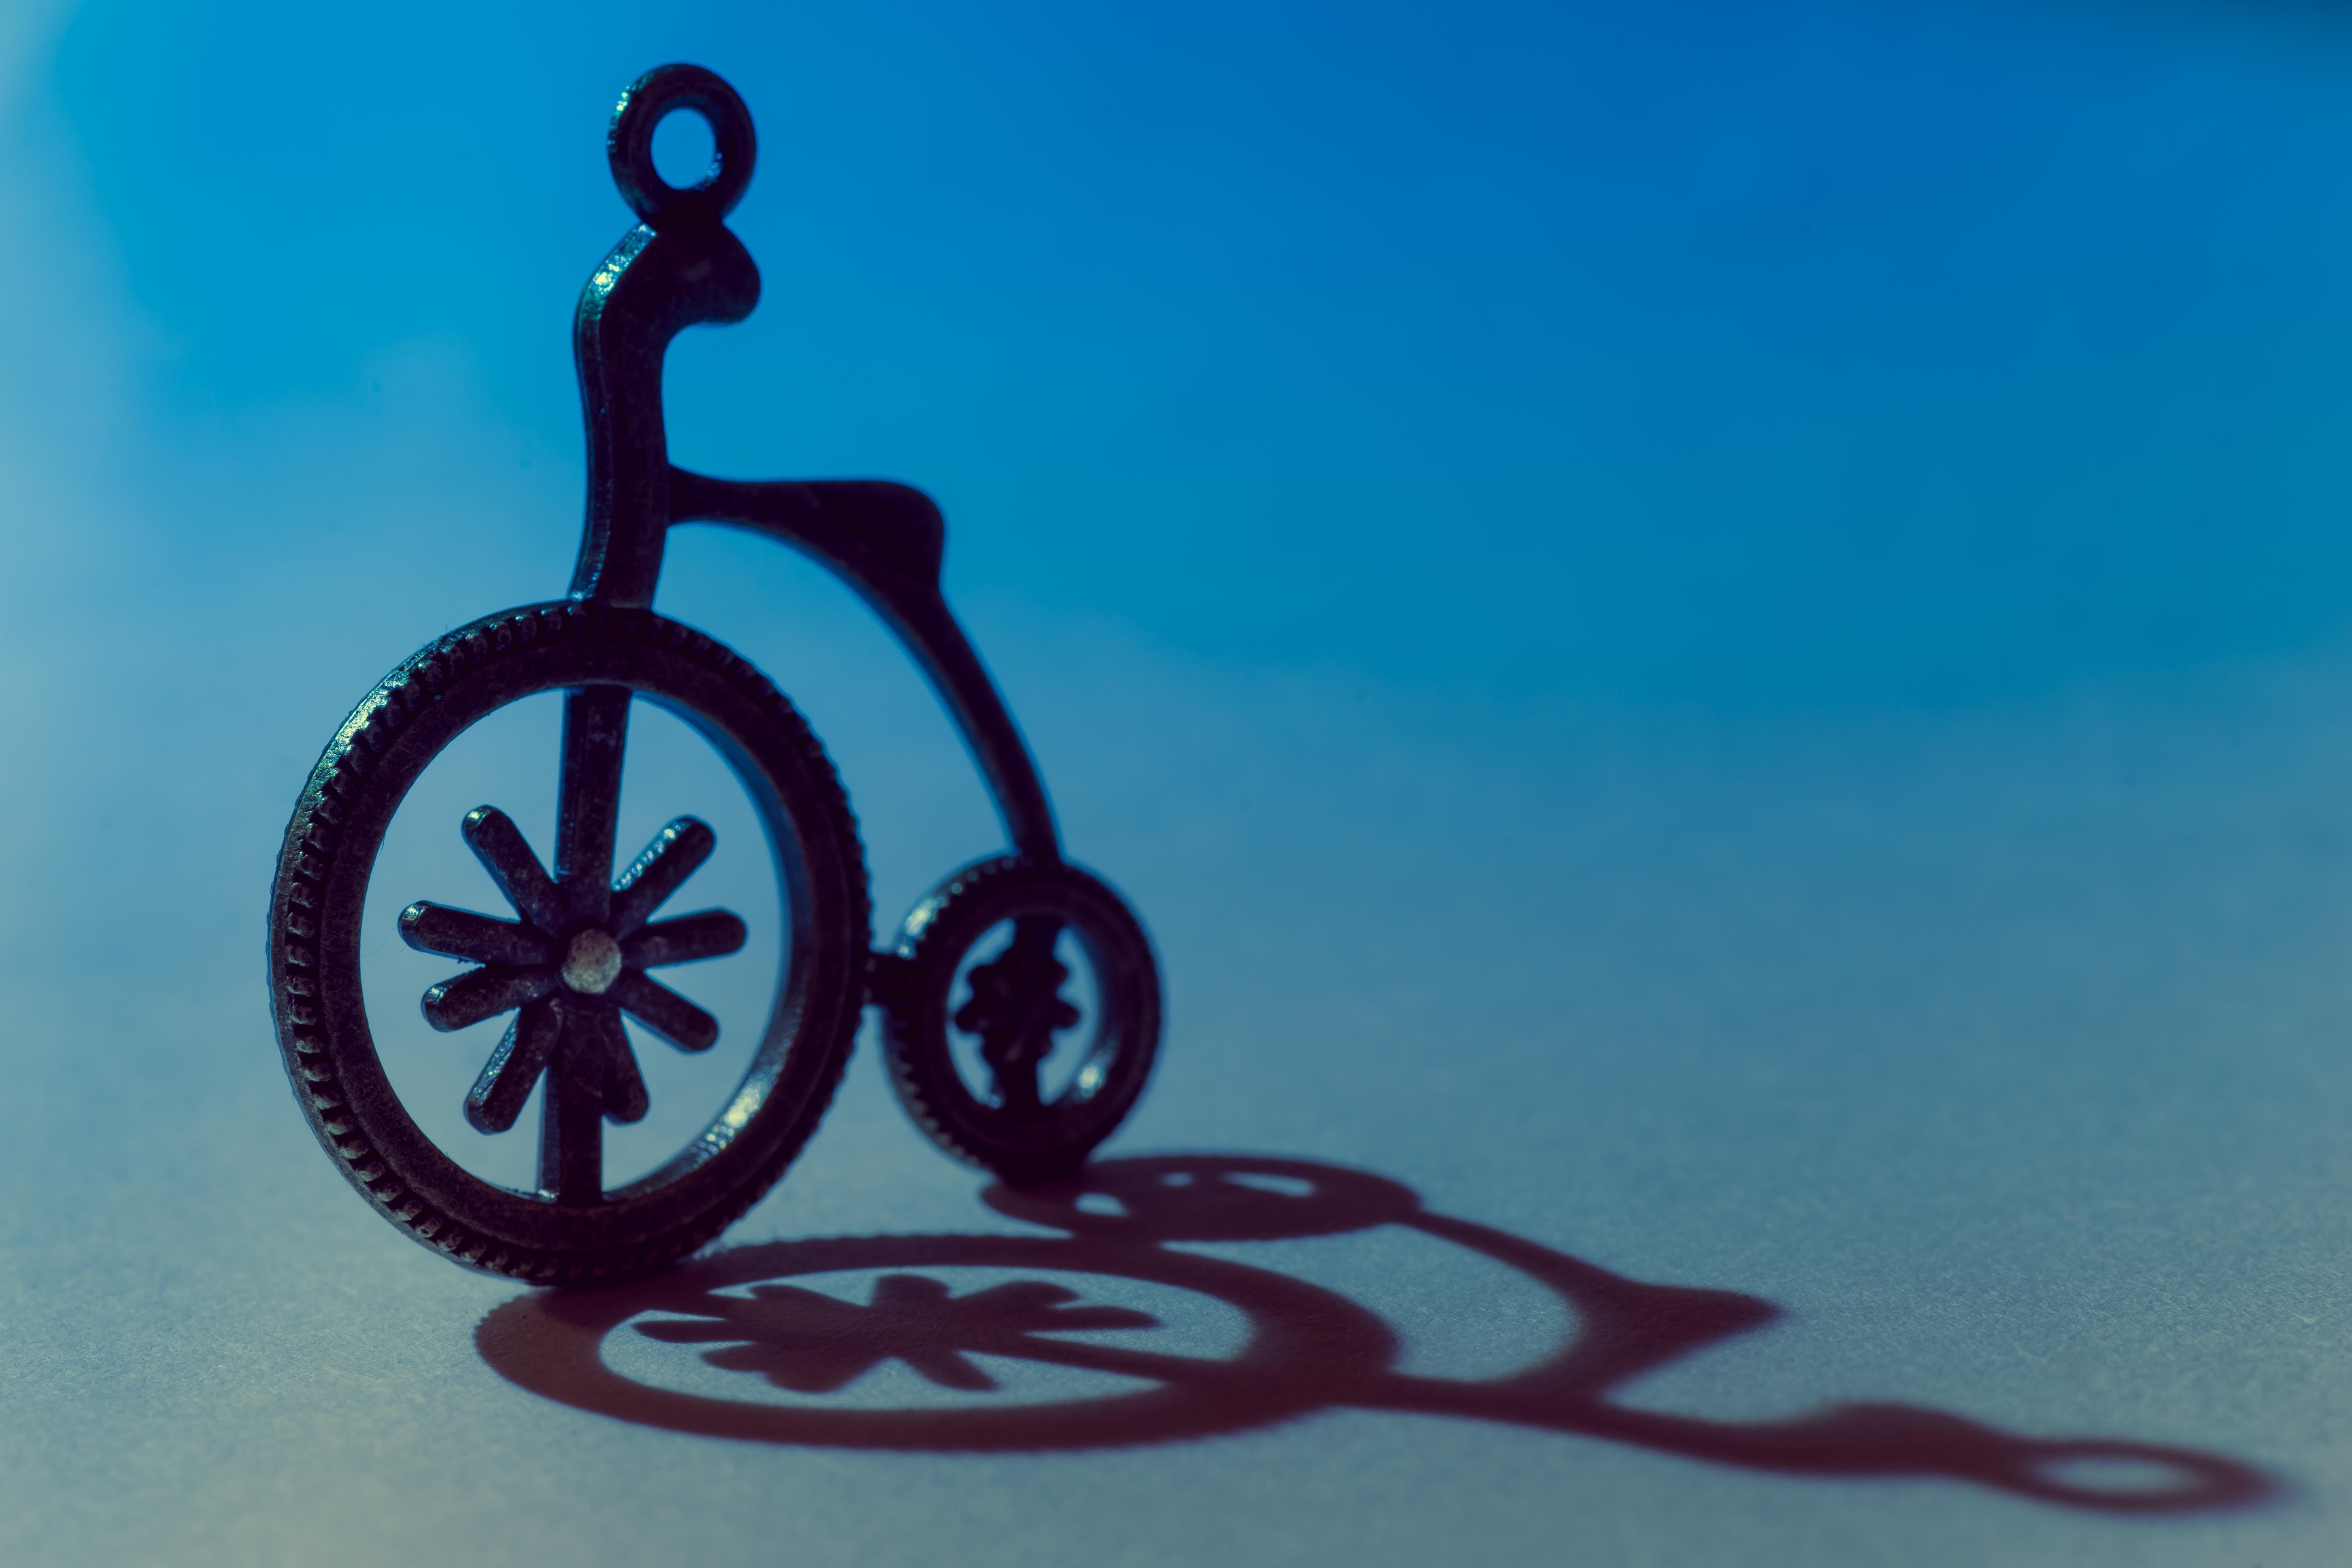 Kostenlose foto : Fahrrad, Fahrzeug, Schatten, blau, Kreis ...